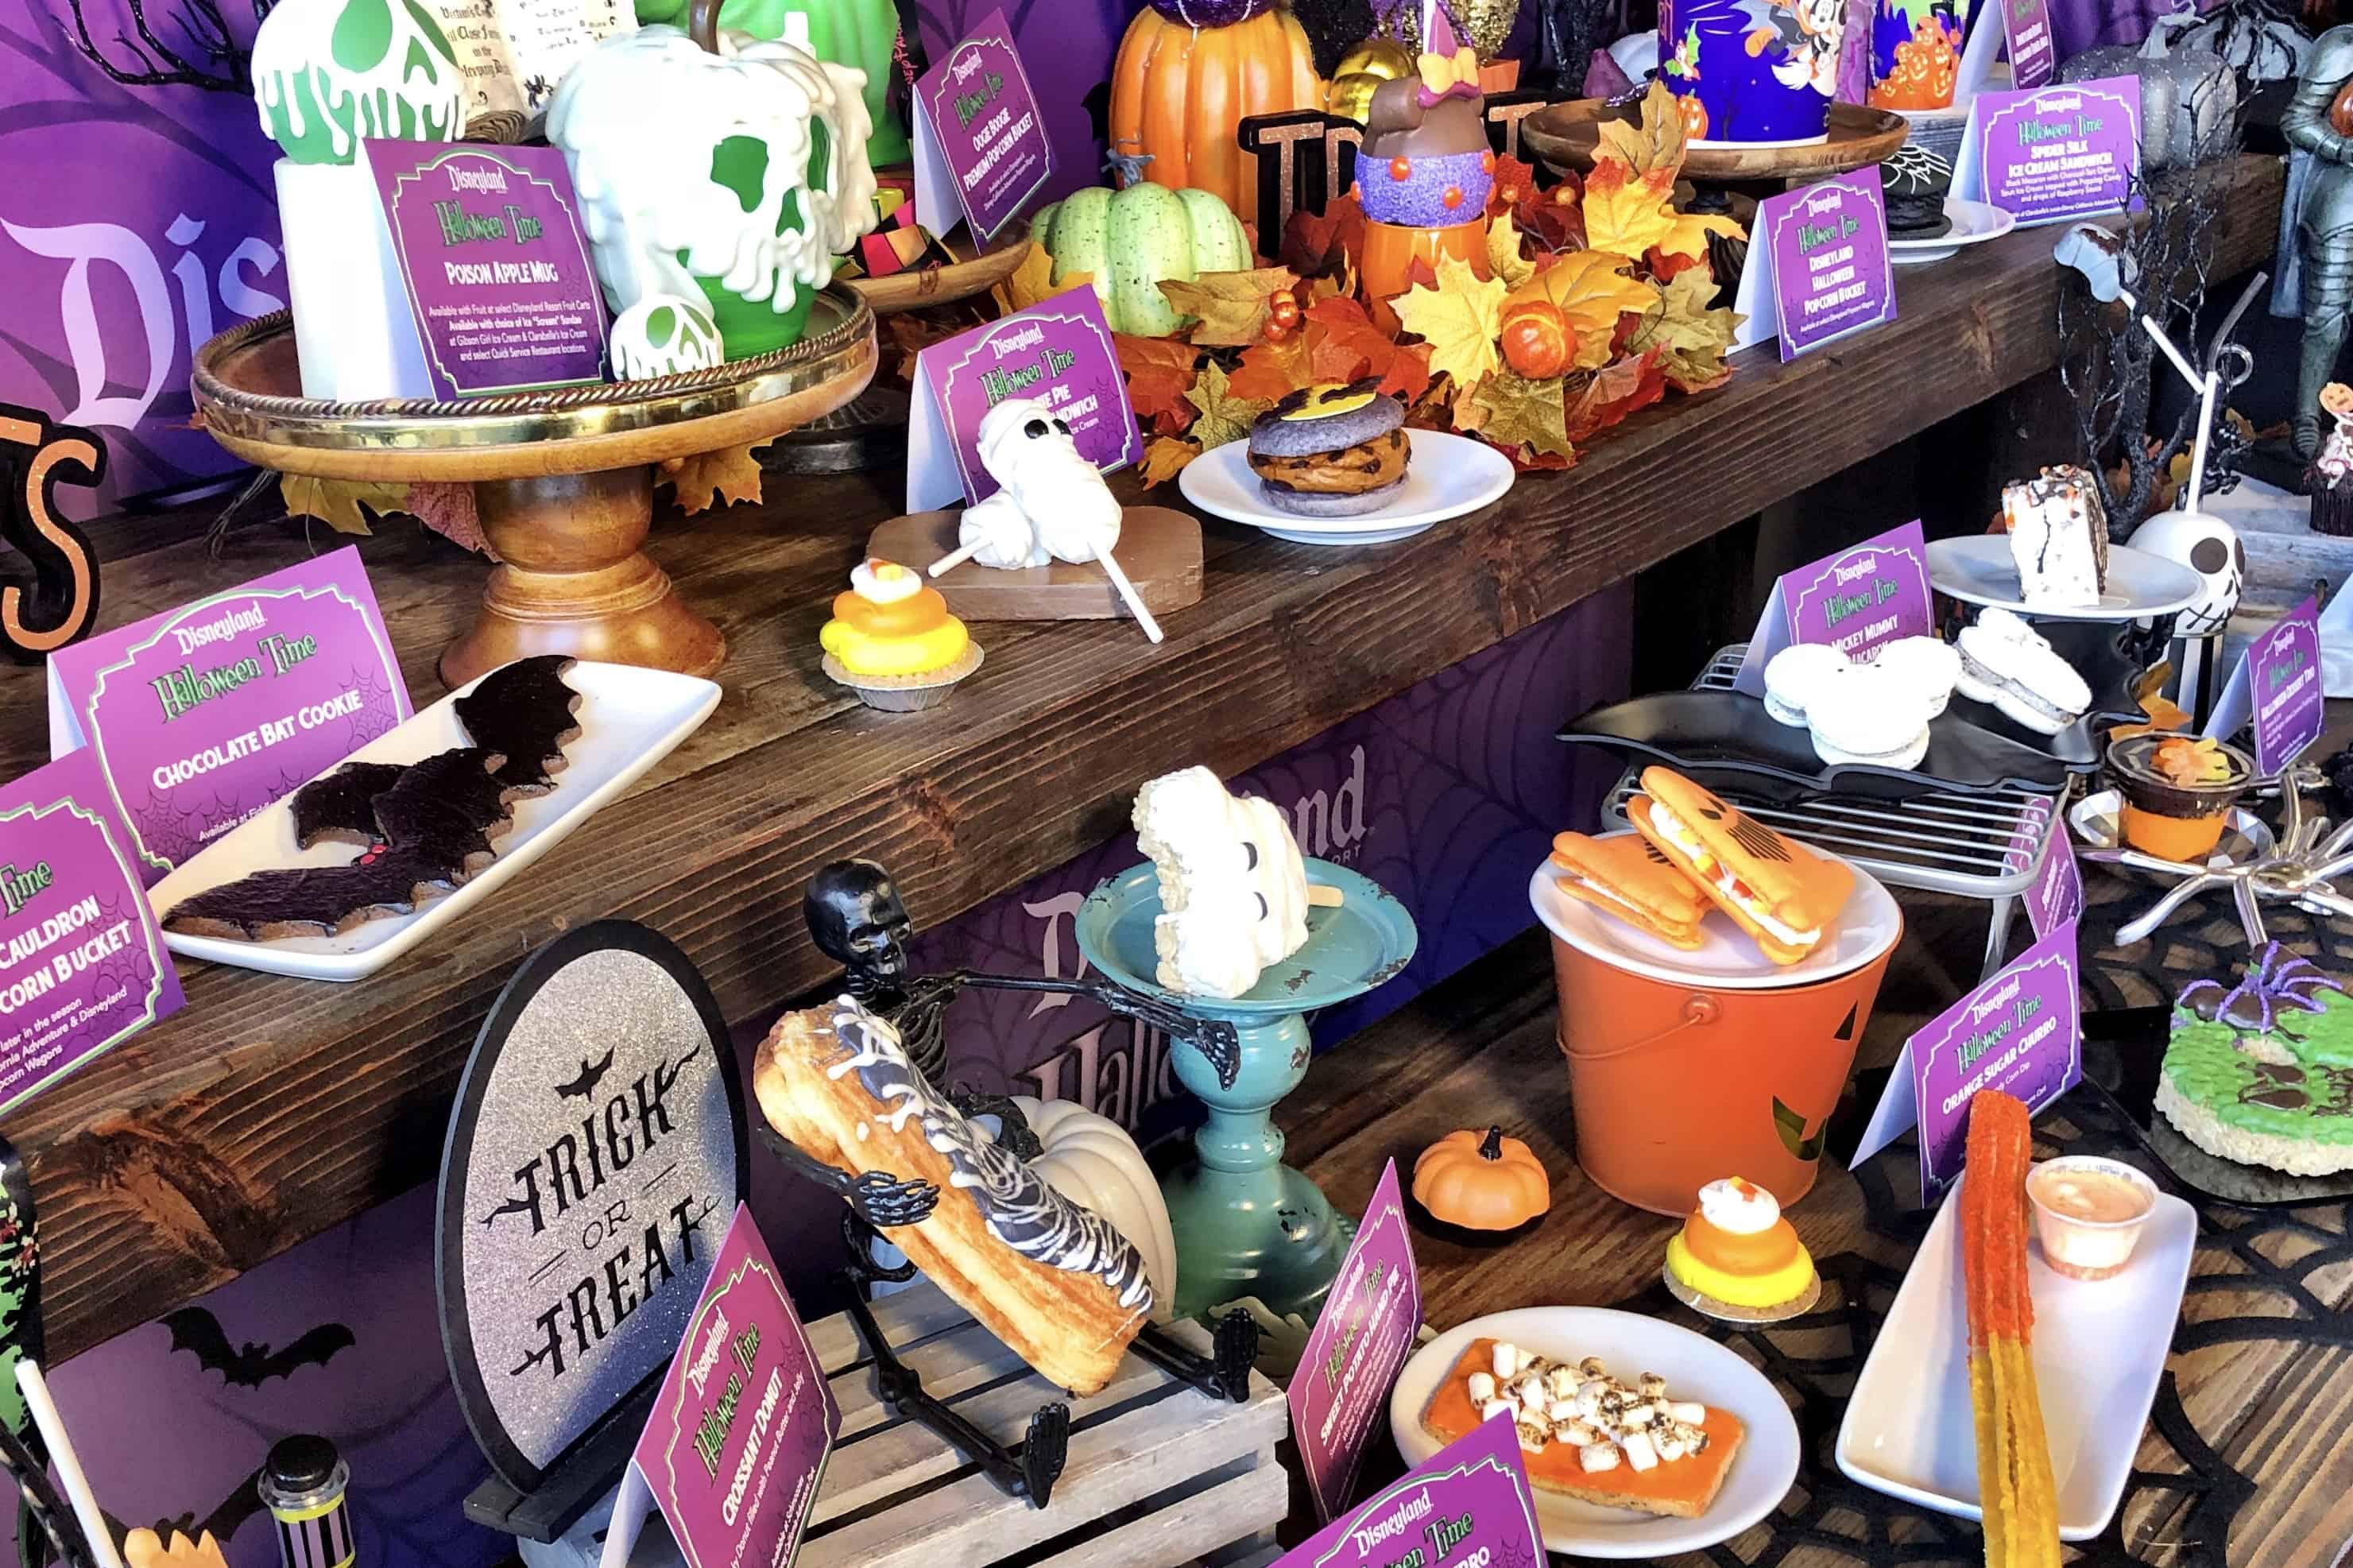 Disneyland Halloween Popcorn Bucket 2018.Micechat Disneyland Resort Features Top 10 Disneyland